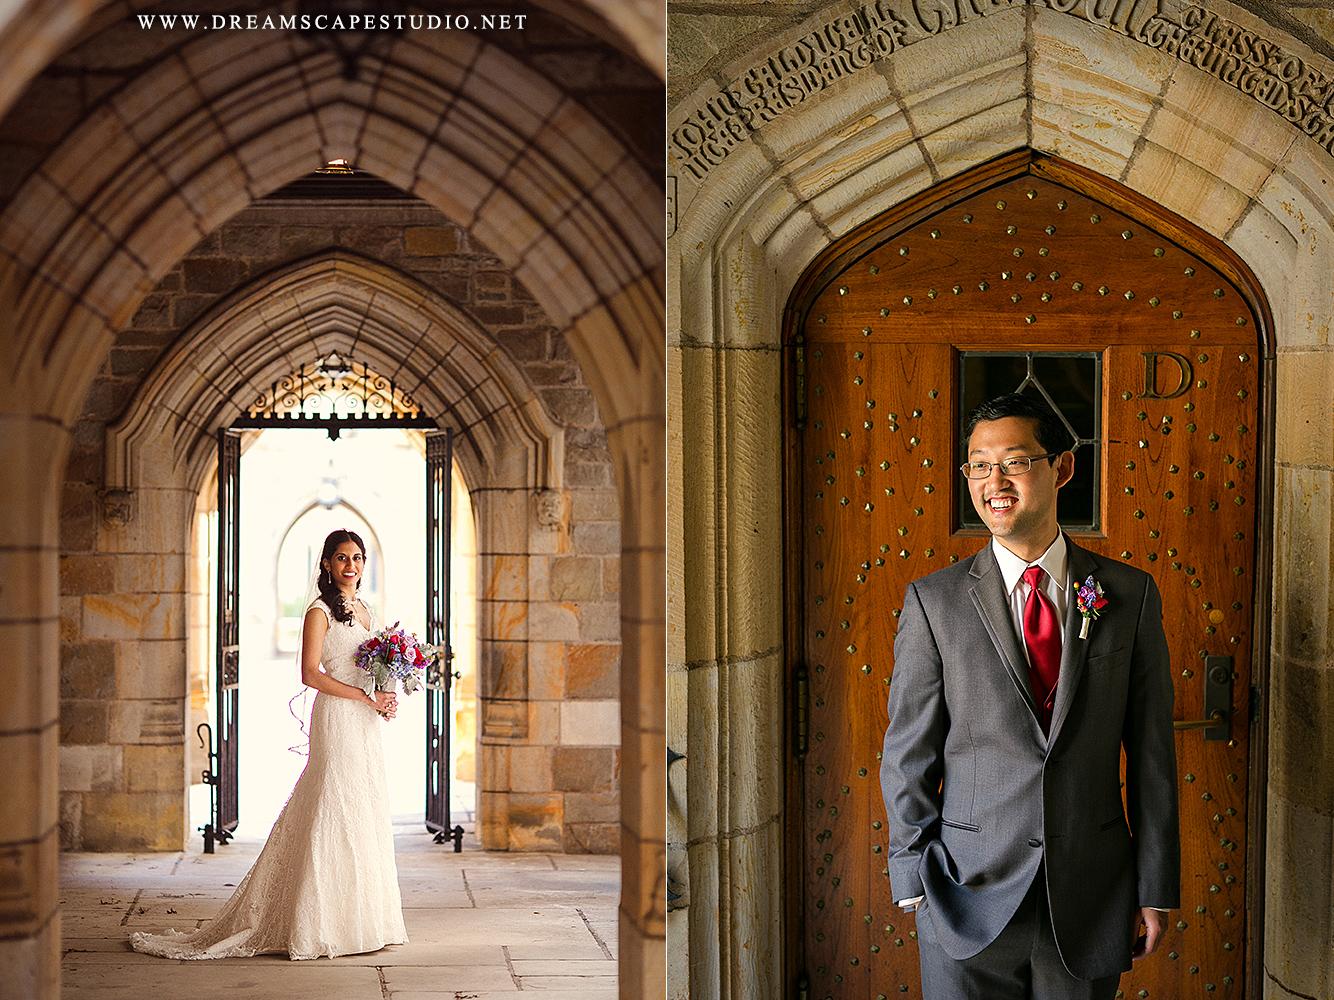 CT_Wedding_Photographer_PaHe_Blog_24.jpg